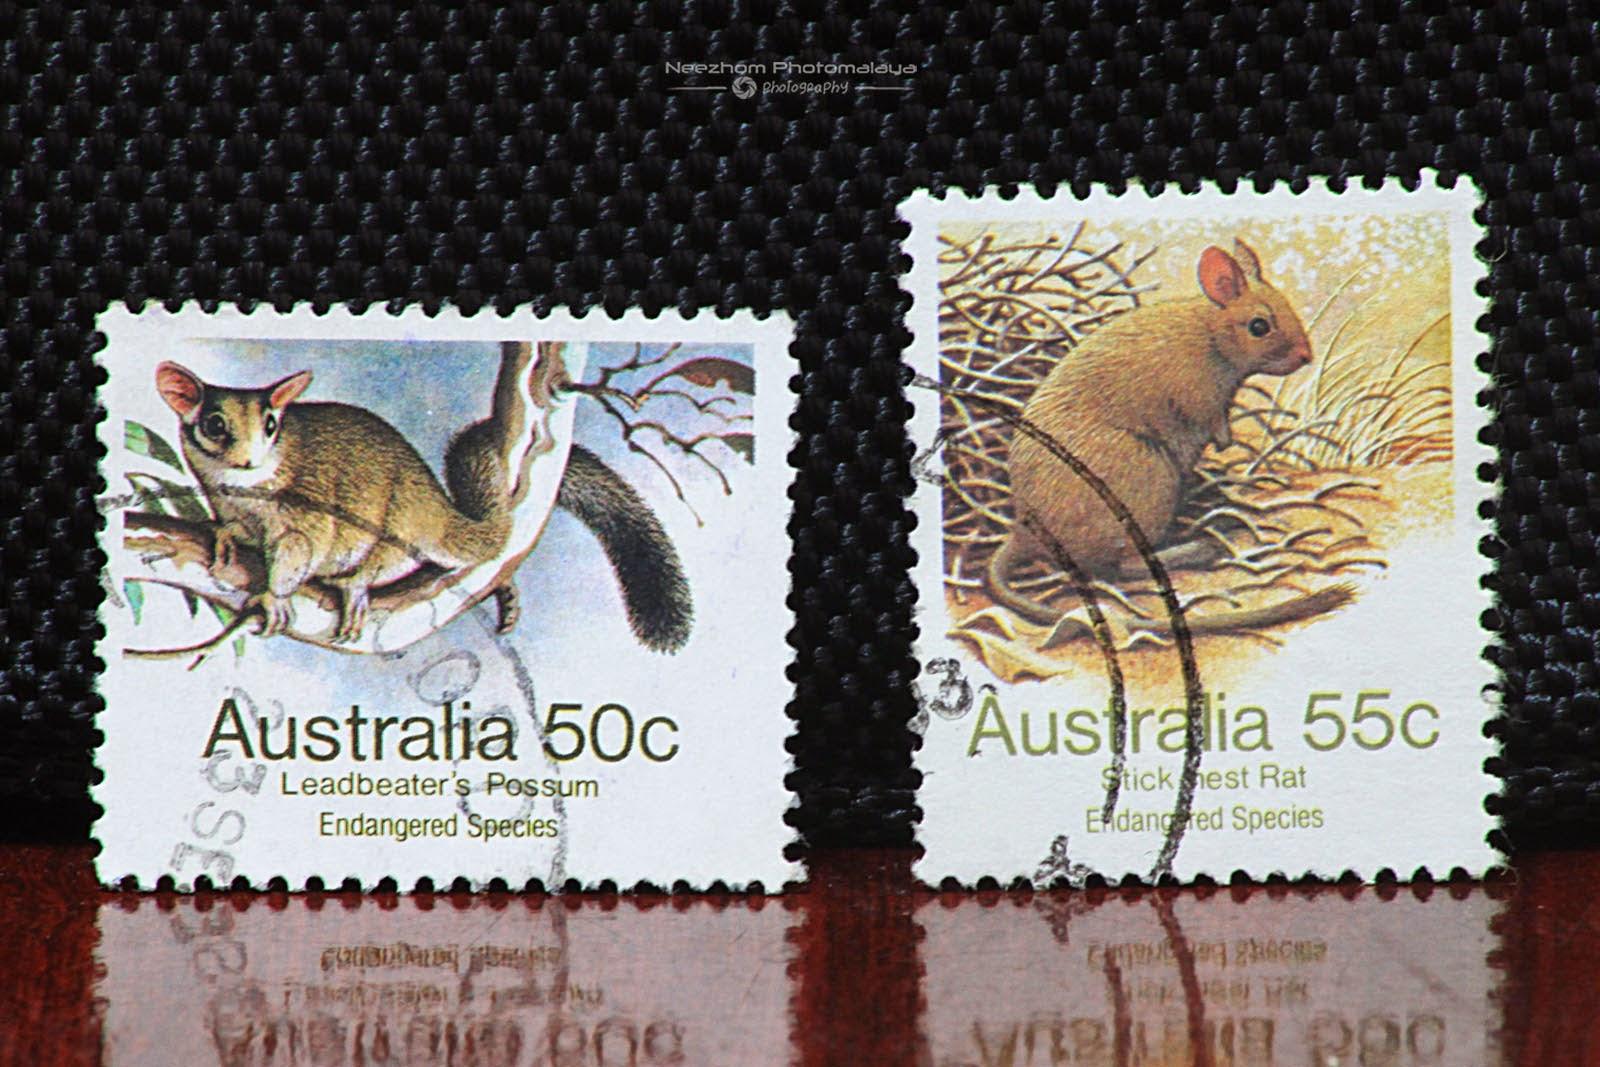 Australia 1981 Endangered Species - Leadbeater Possum 50 cents, Stick nest Rat 55 cents